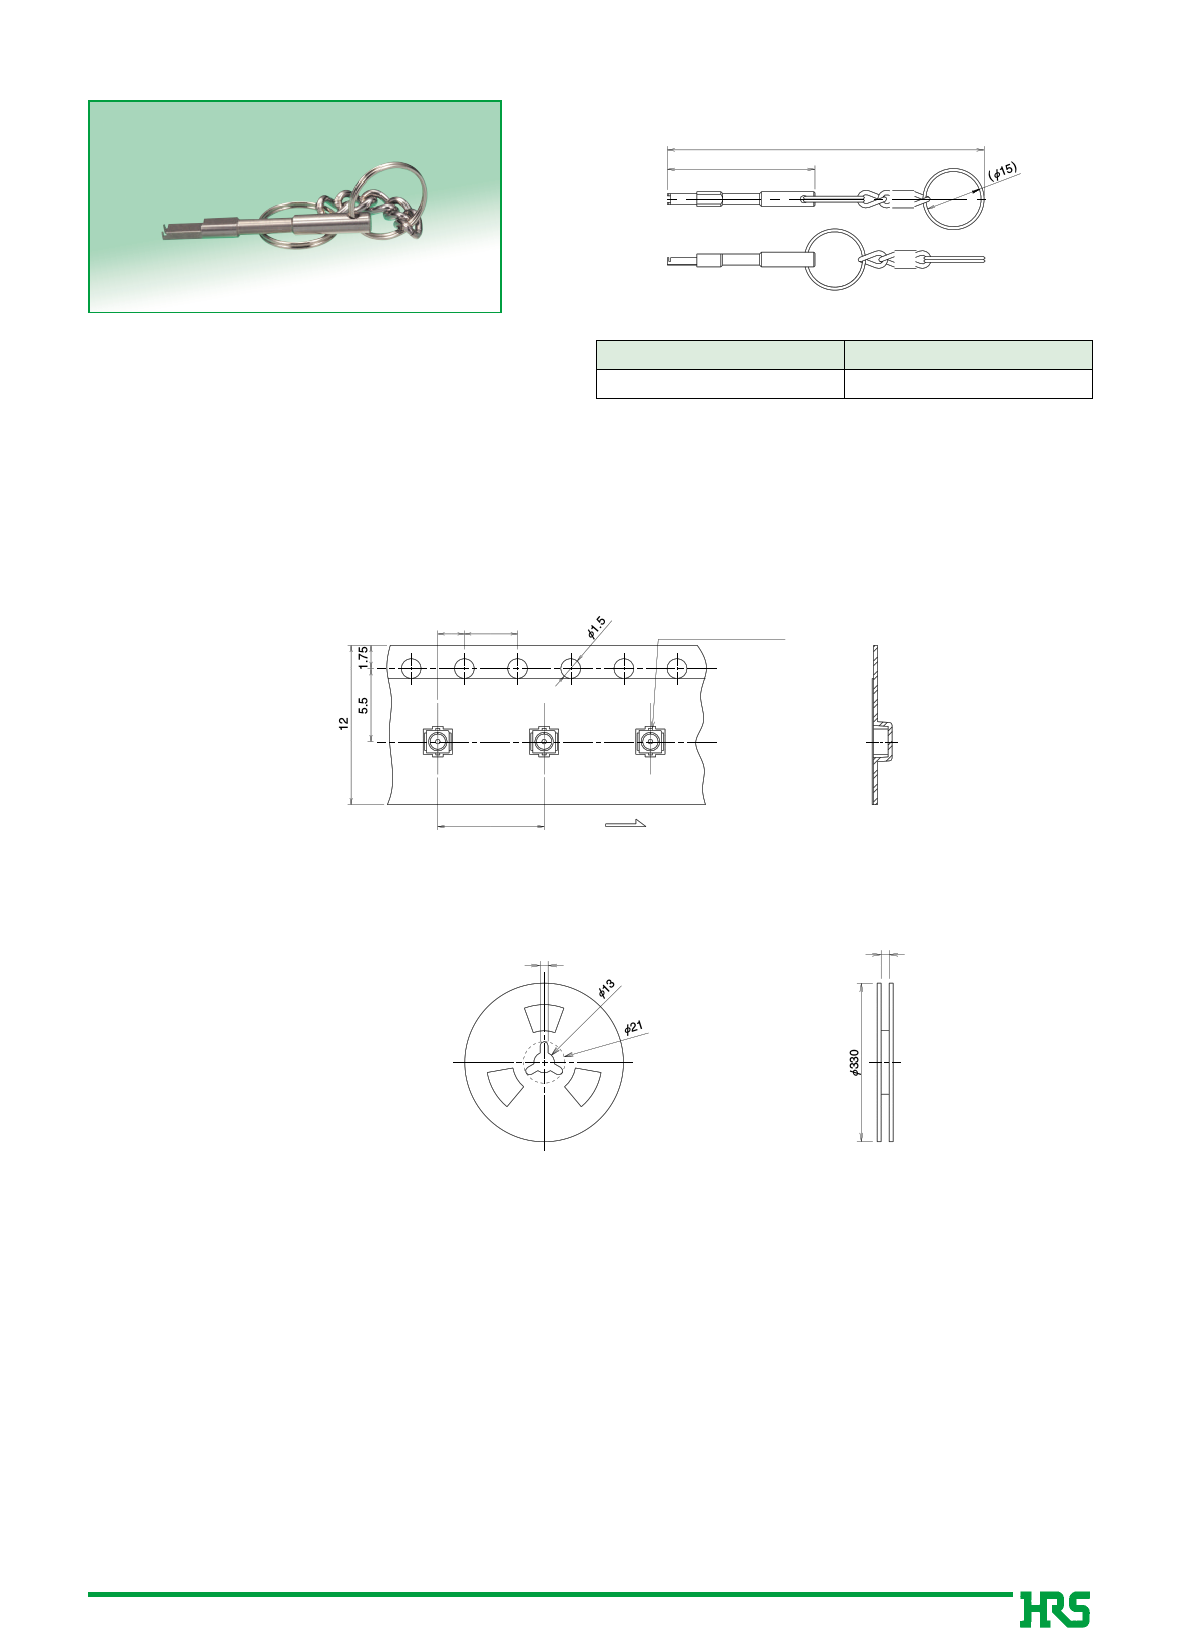 W.FL-2LP-04N2-A-L pdf, arduino